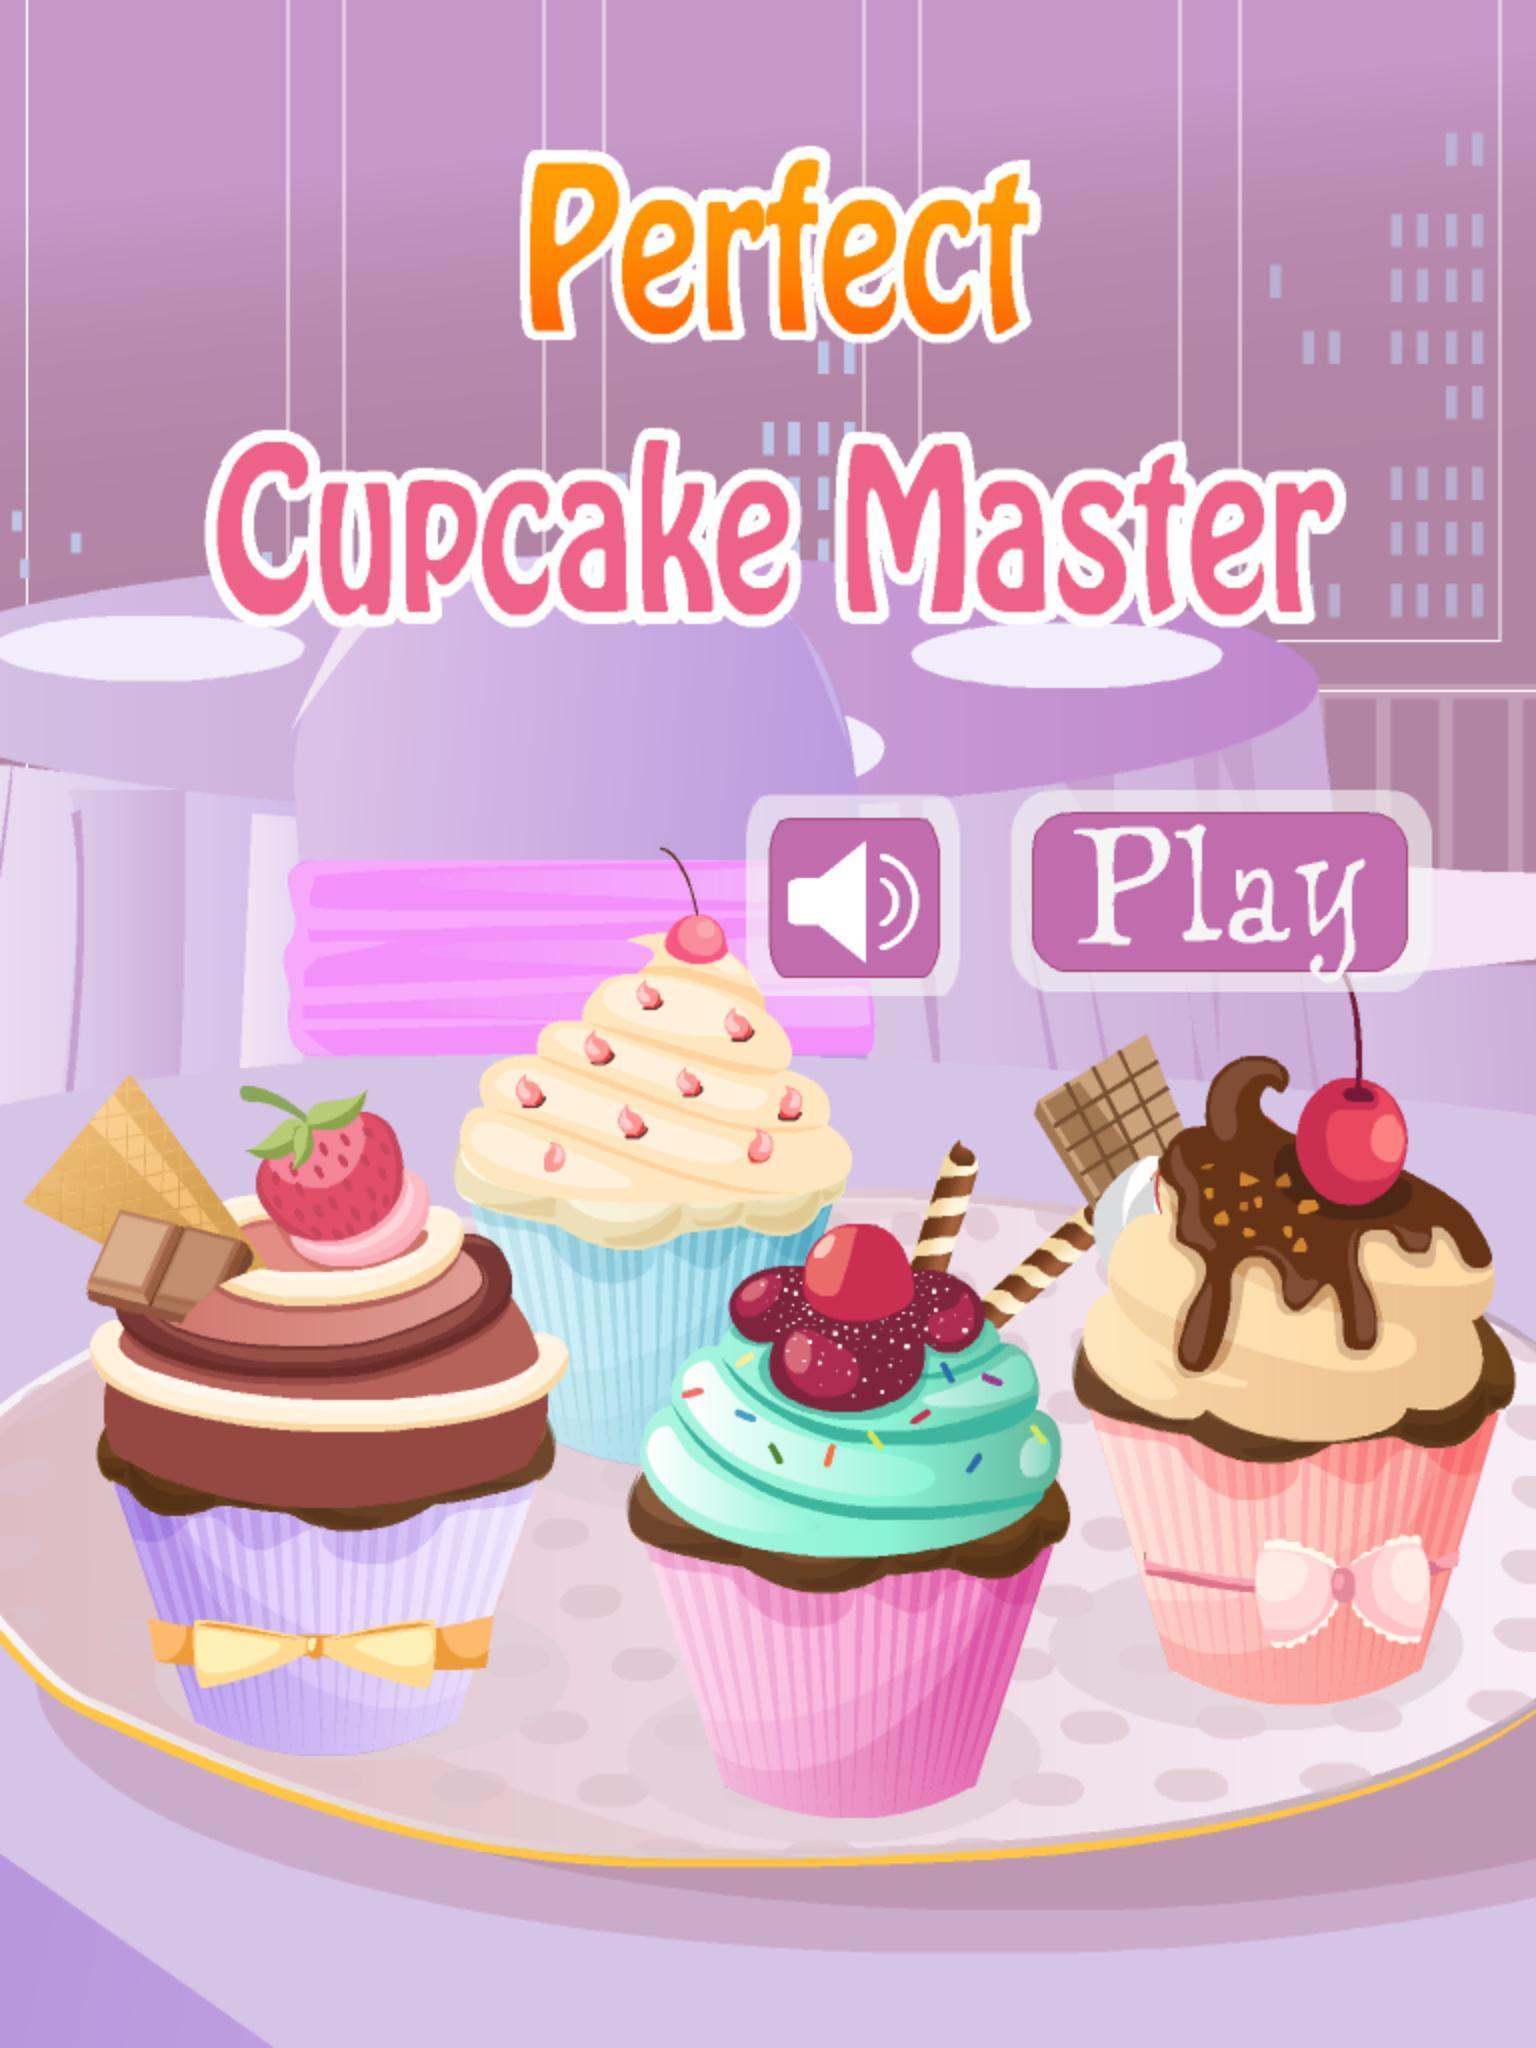 Perfect Cupcake Master 1.0.2 Screenshot 1